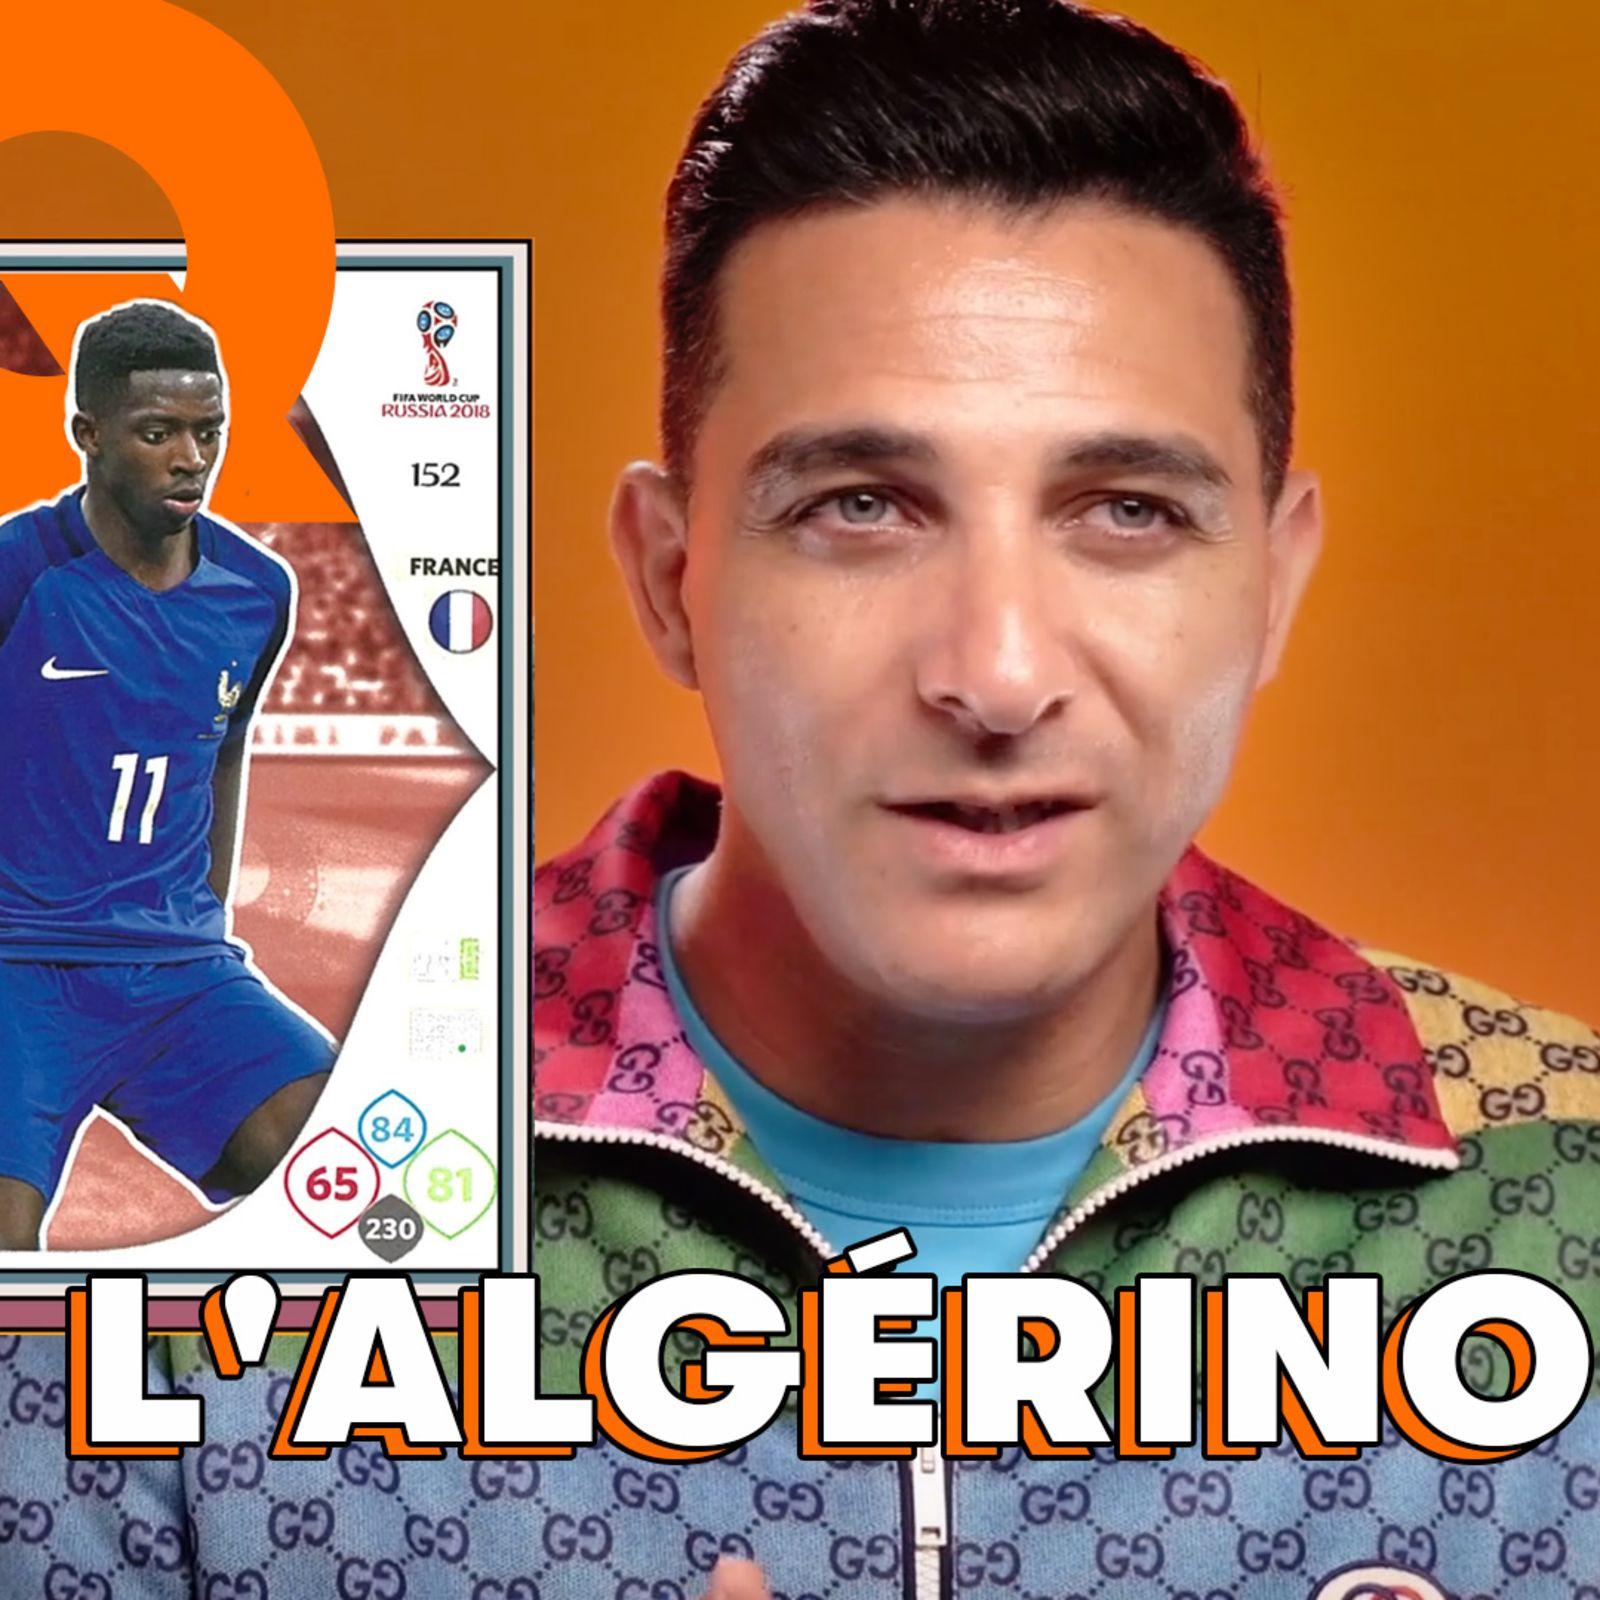 La Tier List football de L'Algérino : Dembélé, Robben, Gerrard